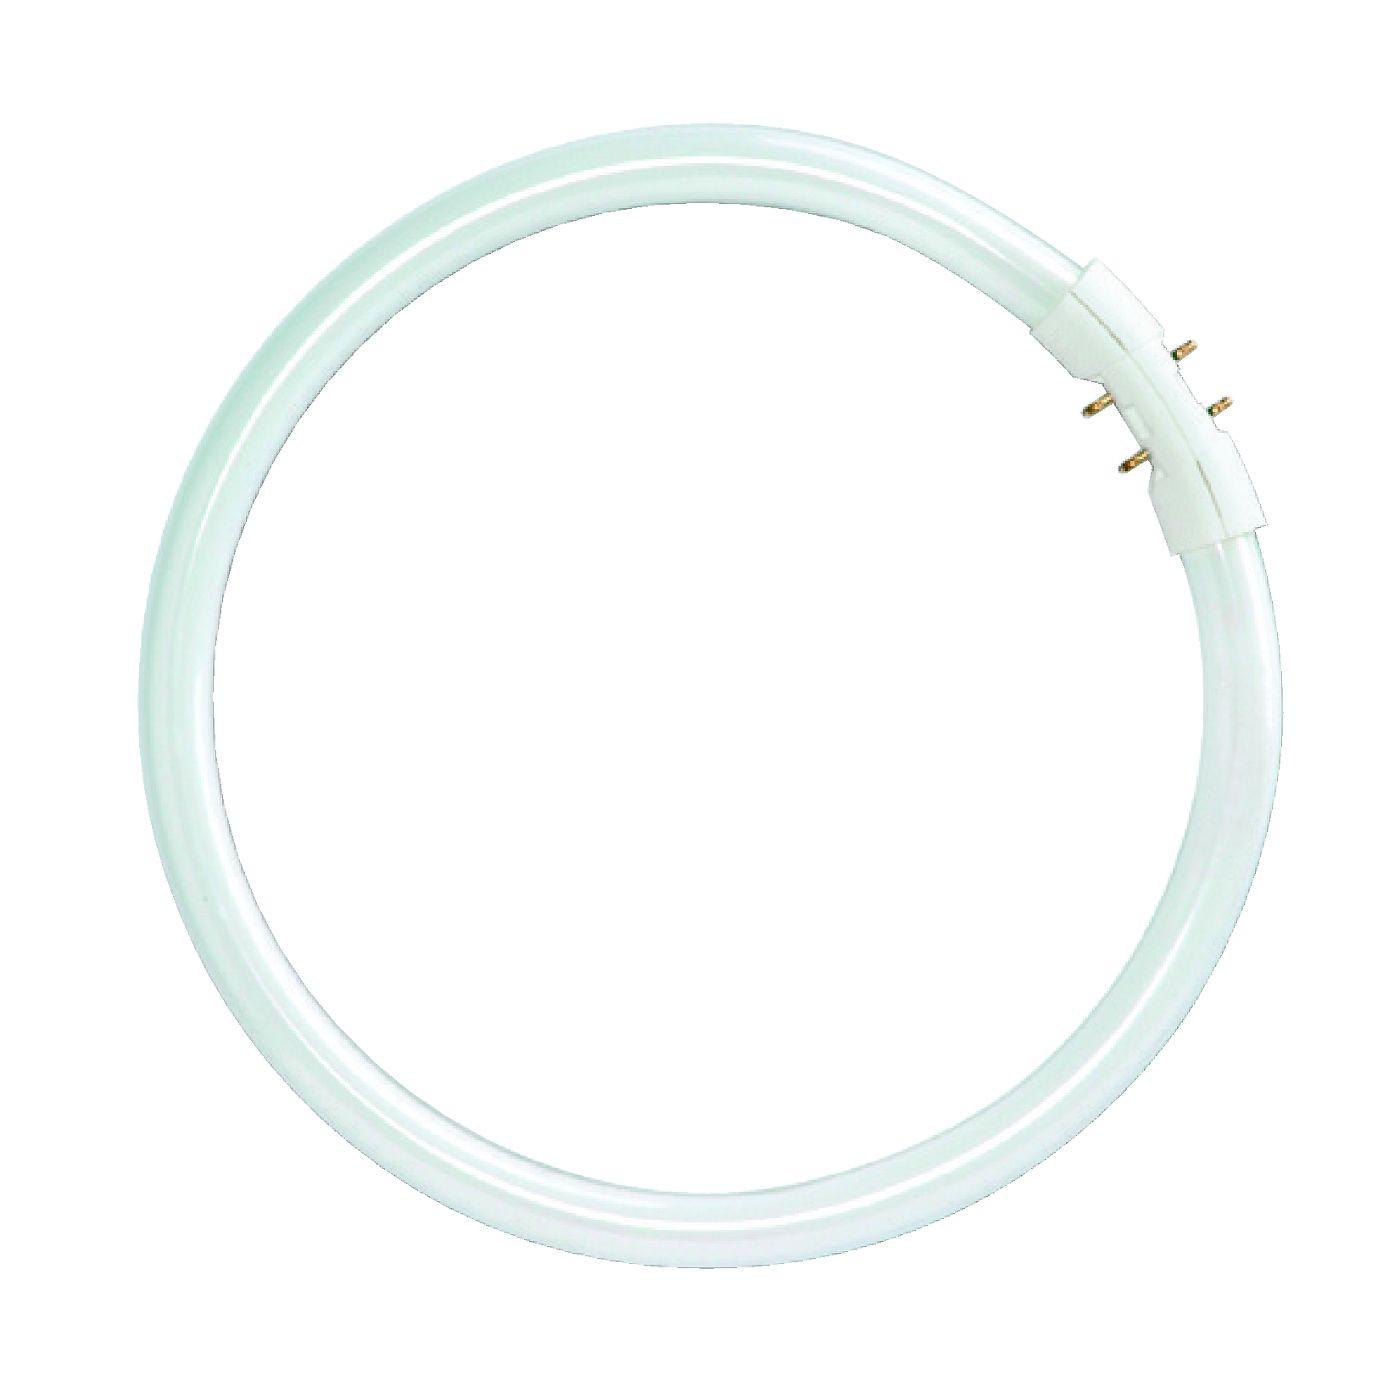 Osram Leuchtstofflampe Ringform T16-R 55W/827 2GX13 warmweiß extra